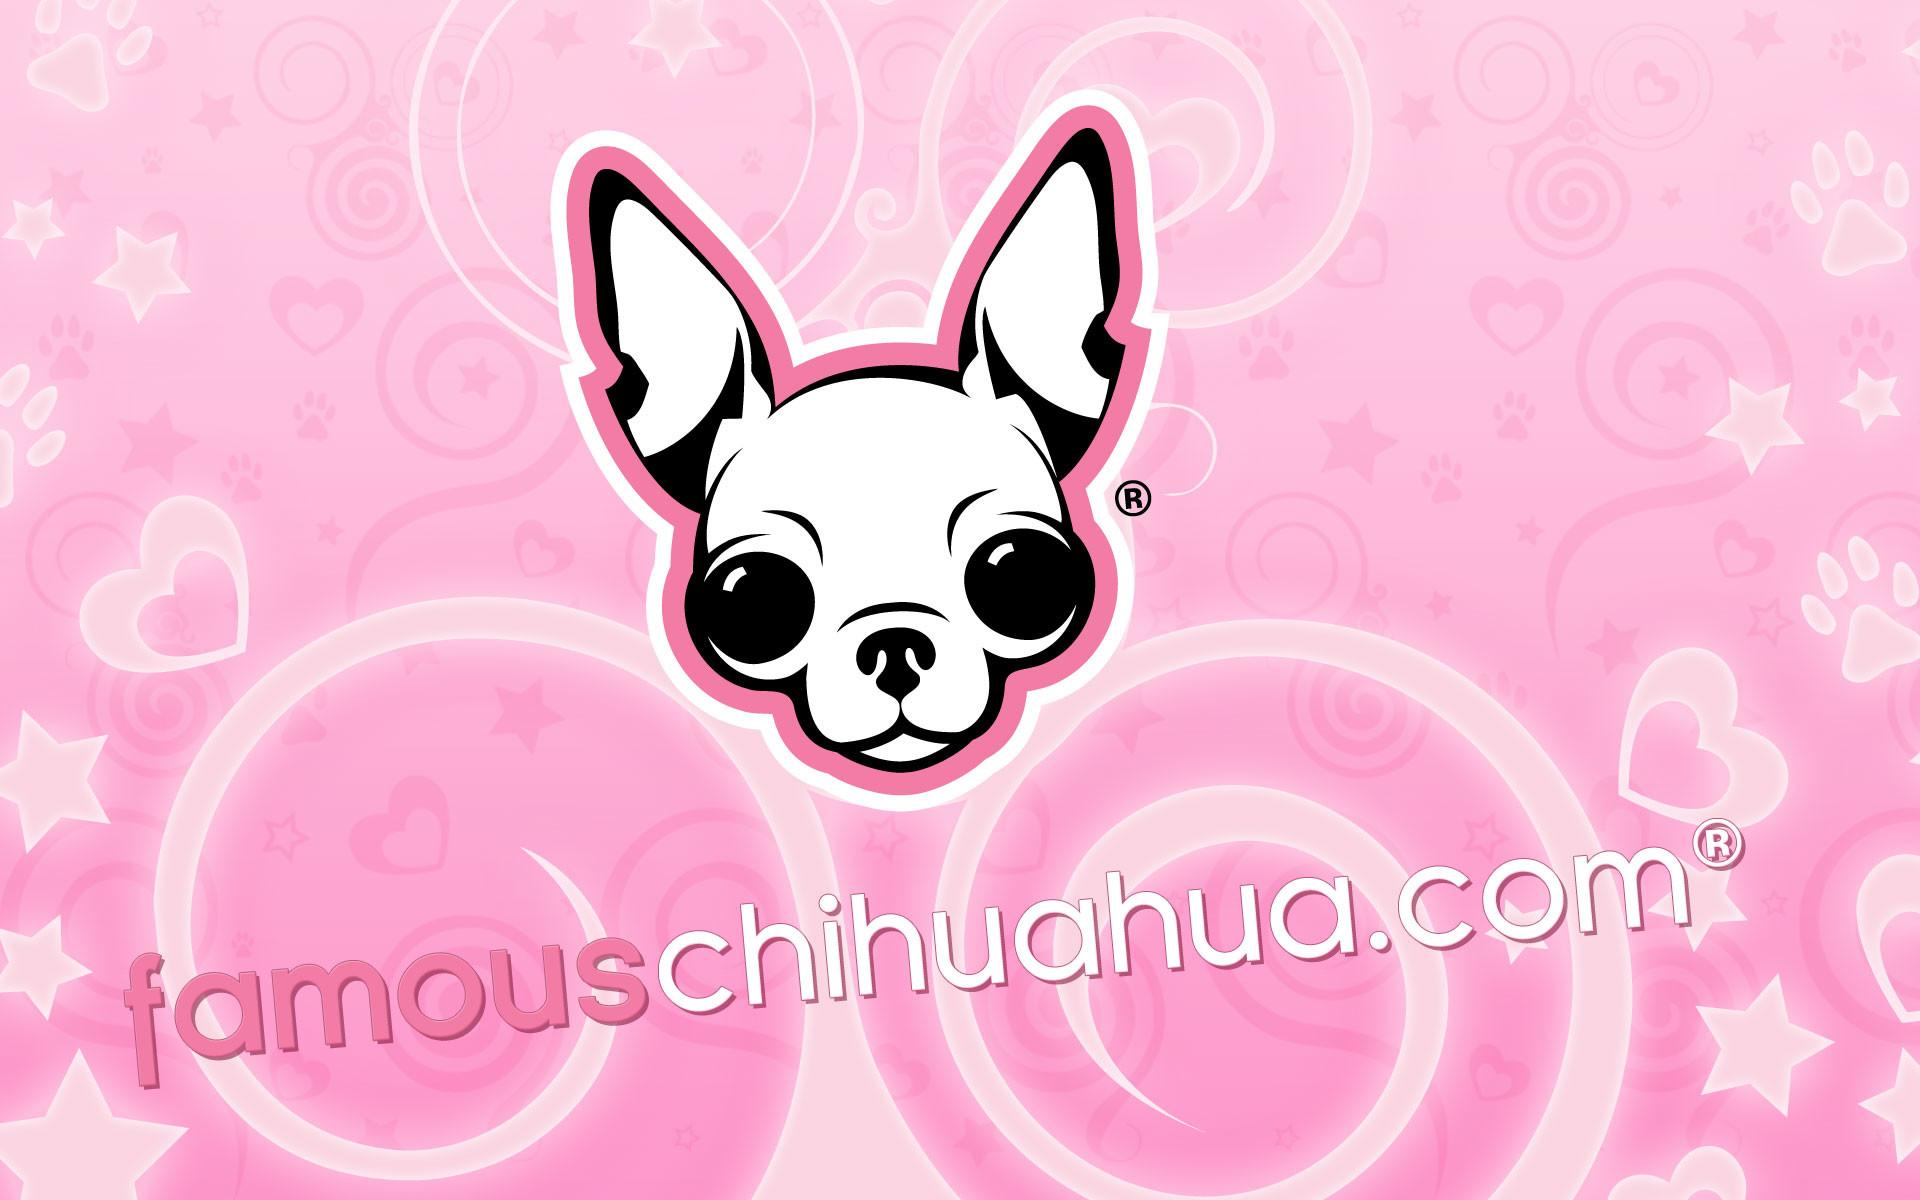 … download famous chihuahua wallpaper (size:1920×1200 pixels)